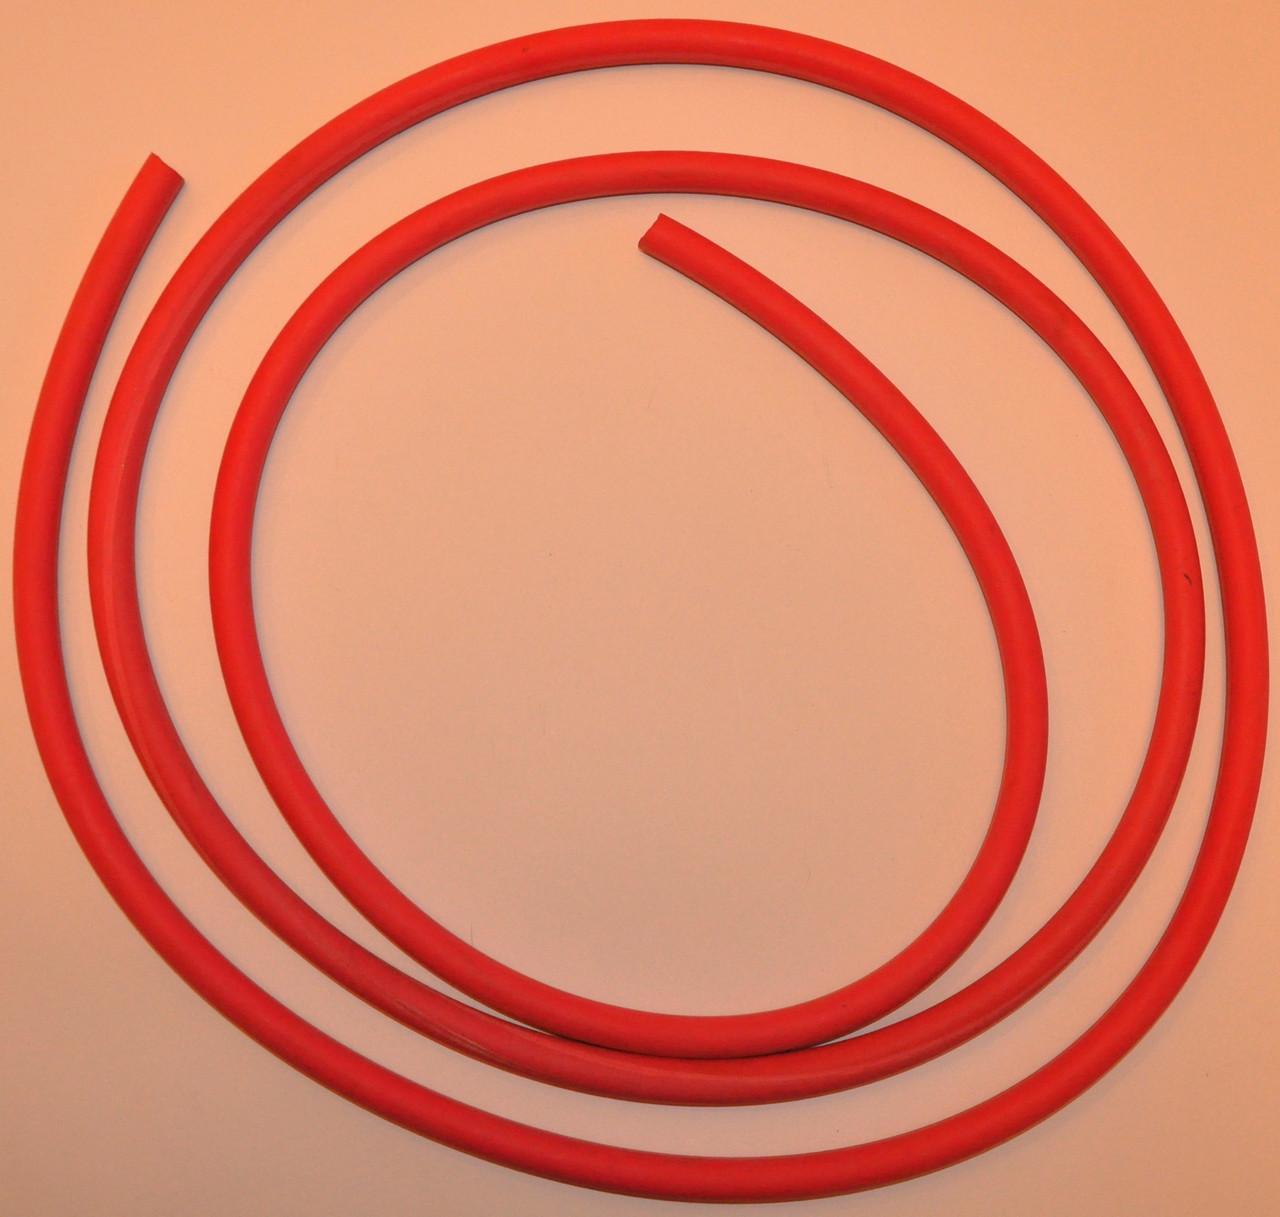 Еспандер джгут гумовий OB-012 діаметр 15 мм